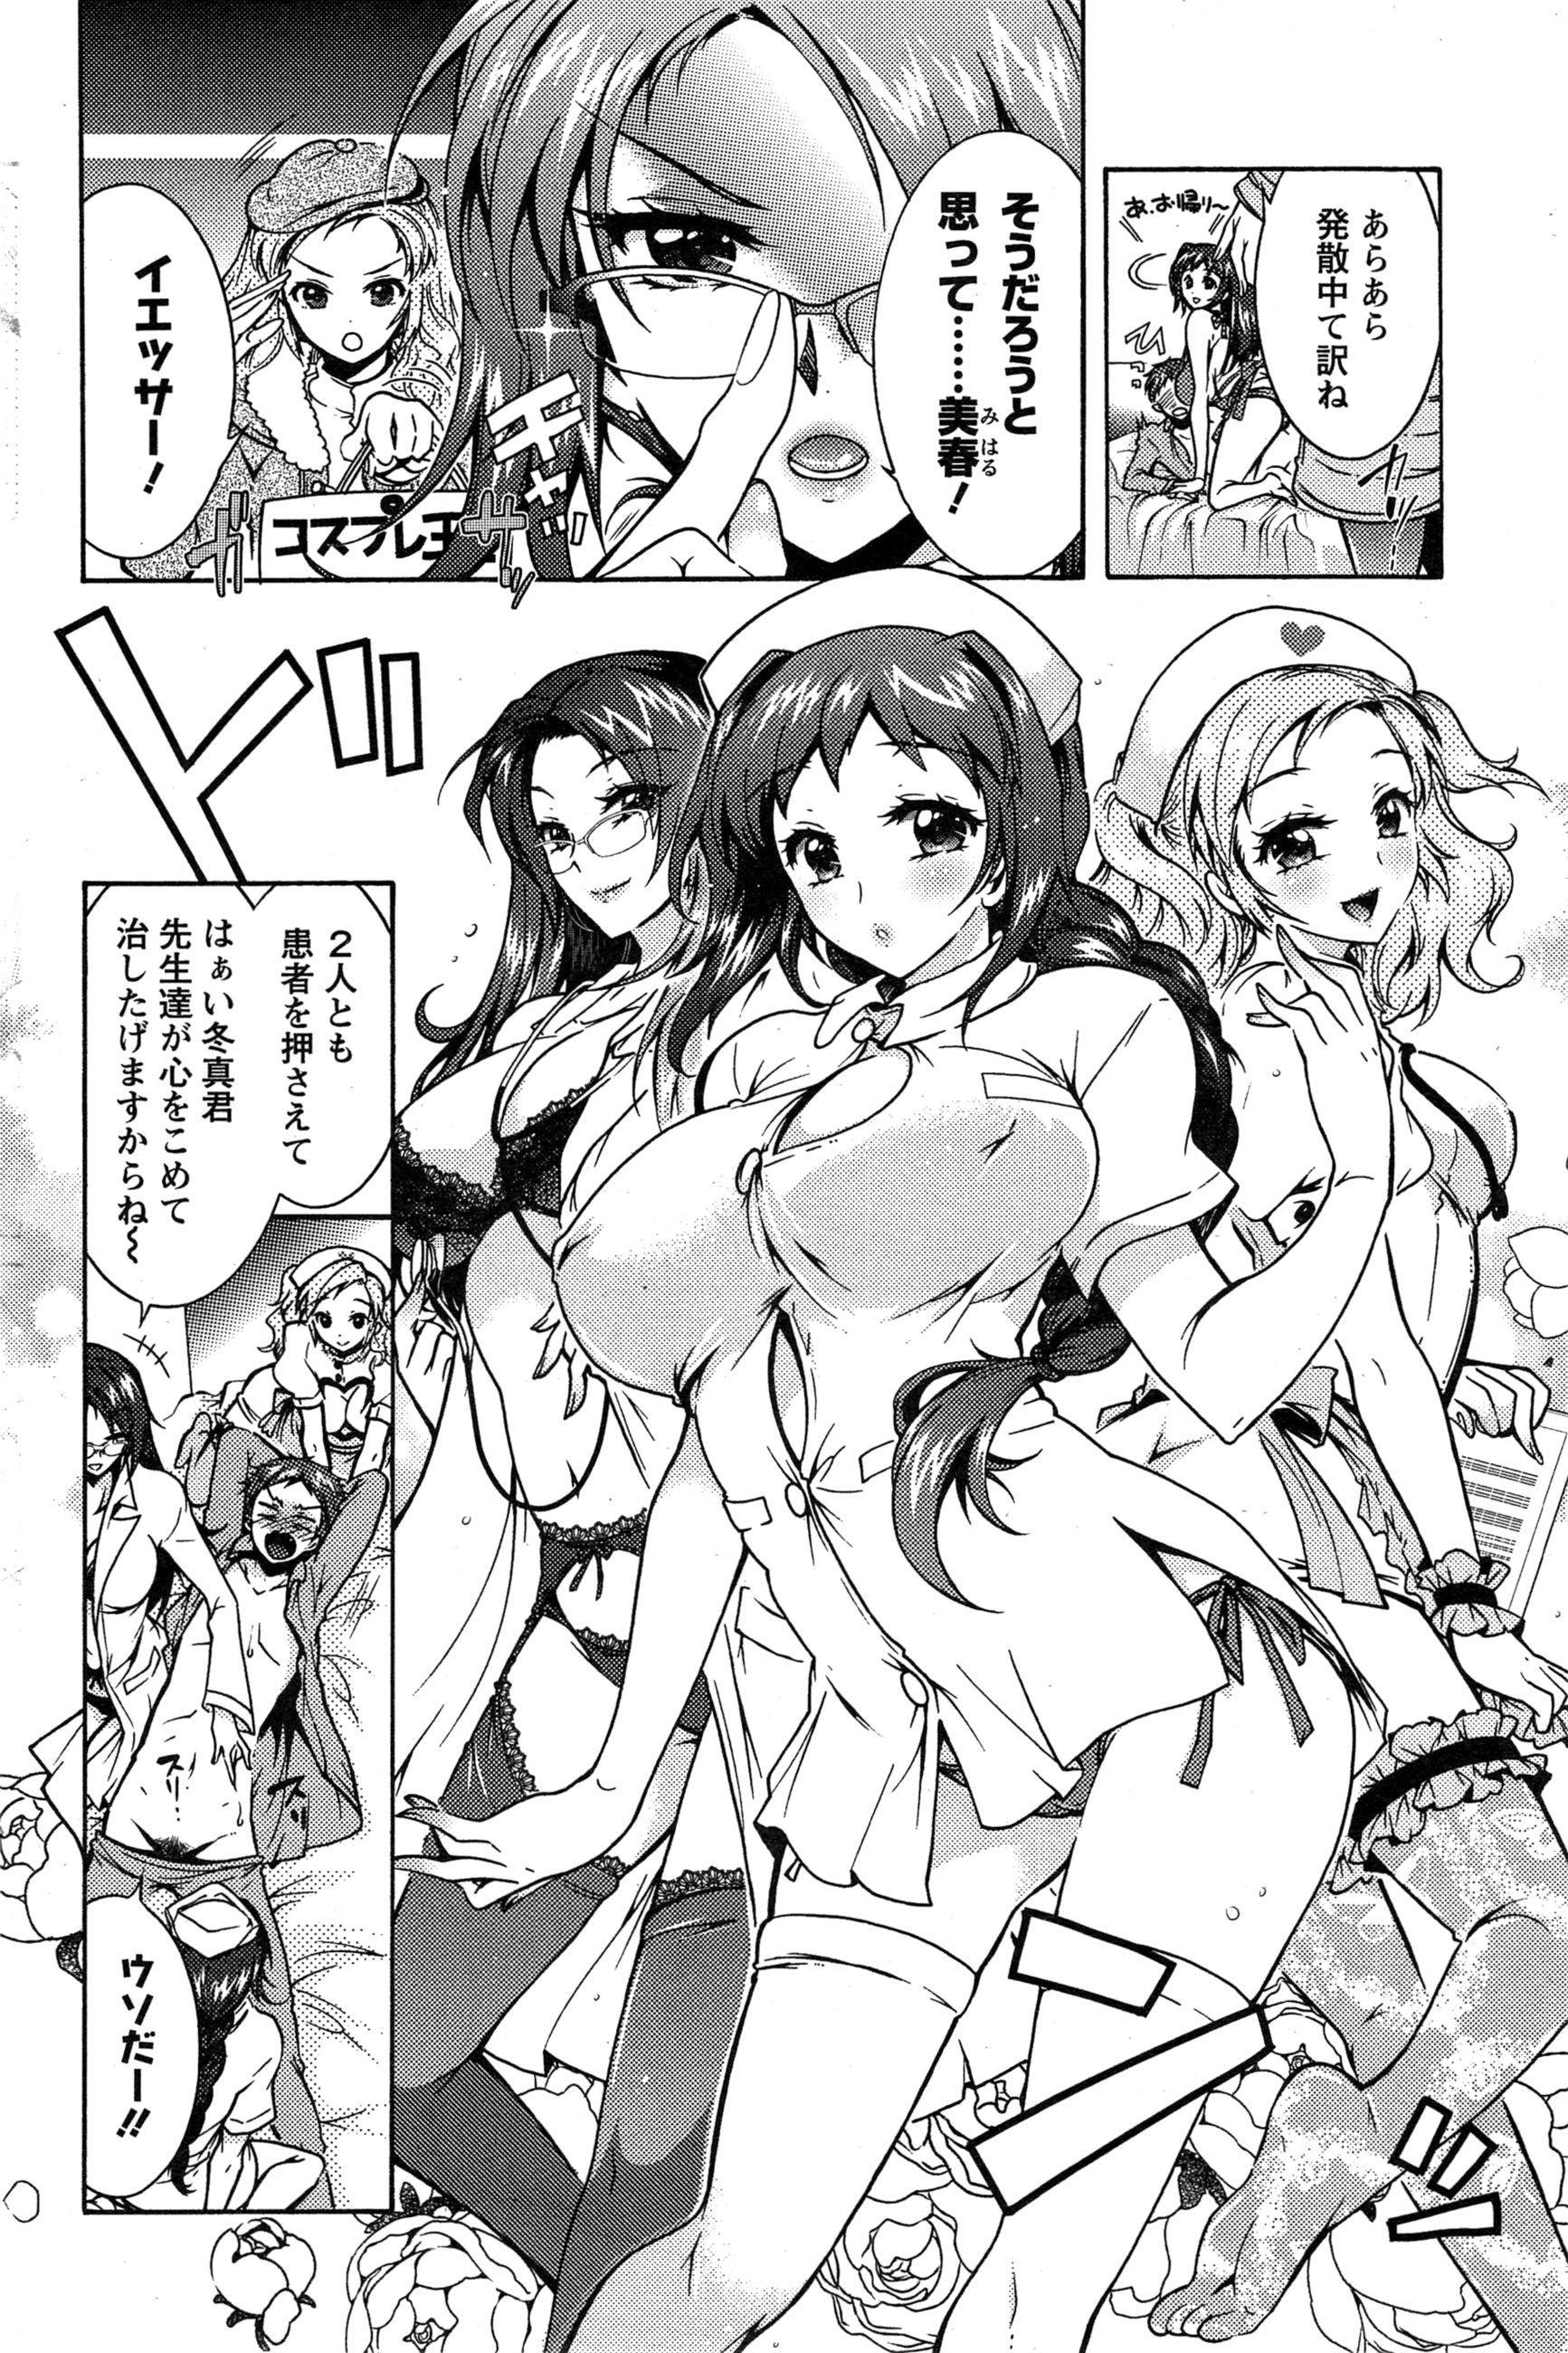 [Honda Arima] Sanshimai no Omocha - The Slave of Three Sisters Ch. 1-6 104